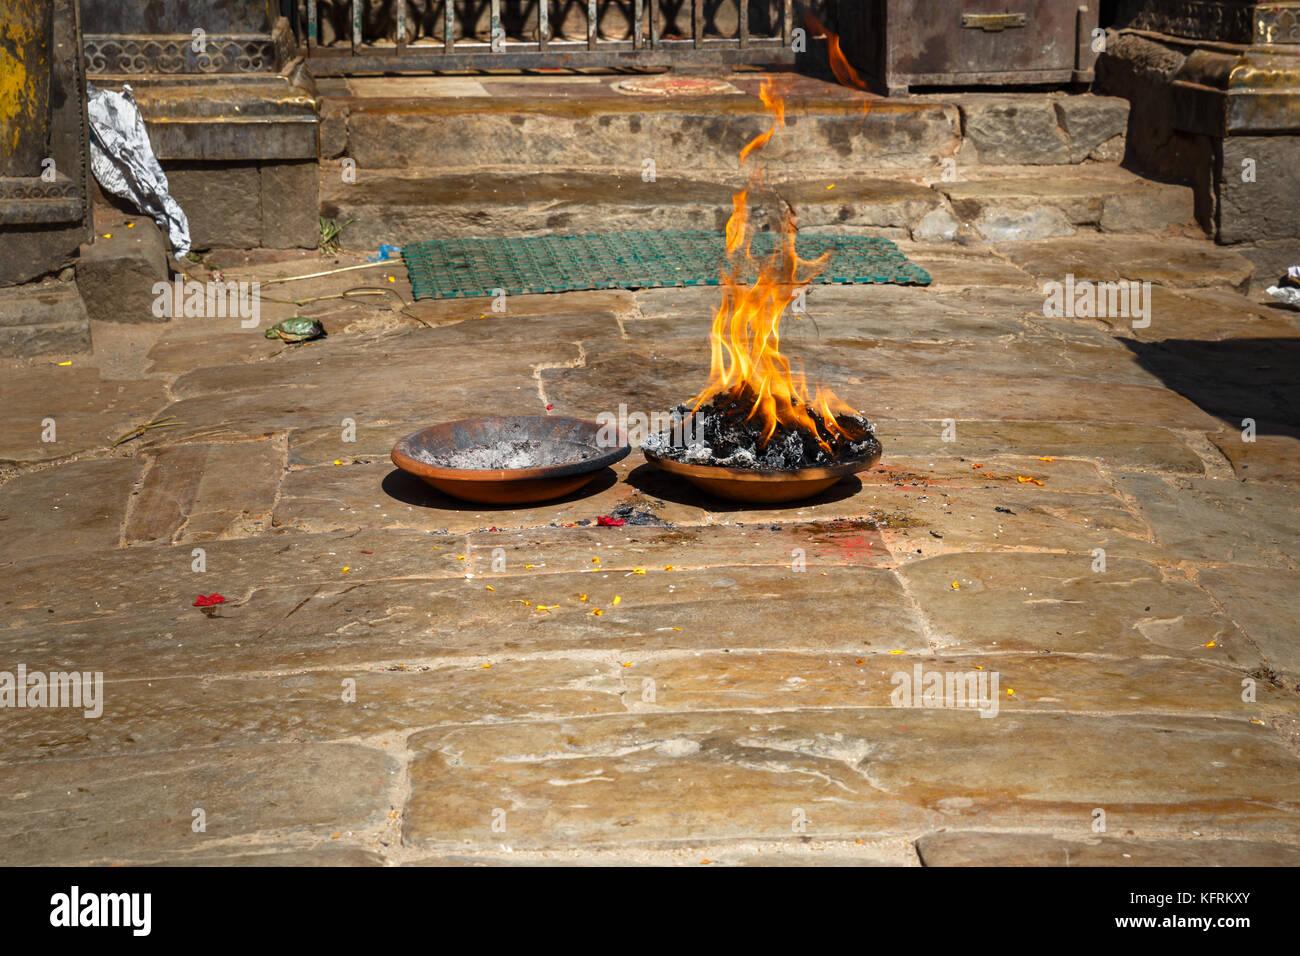 Ritual fire puja near the temple - Stock Image